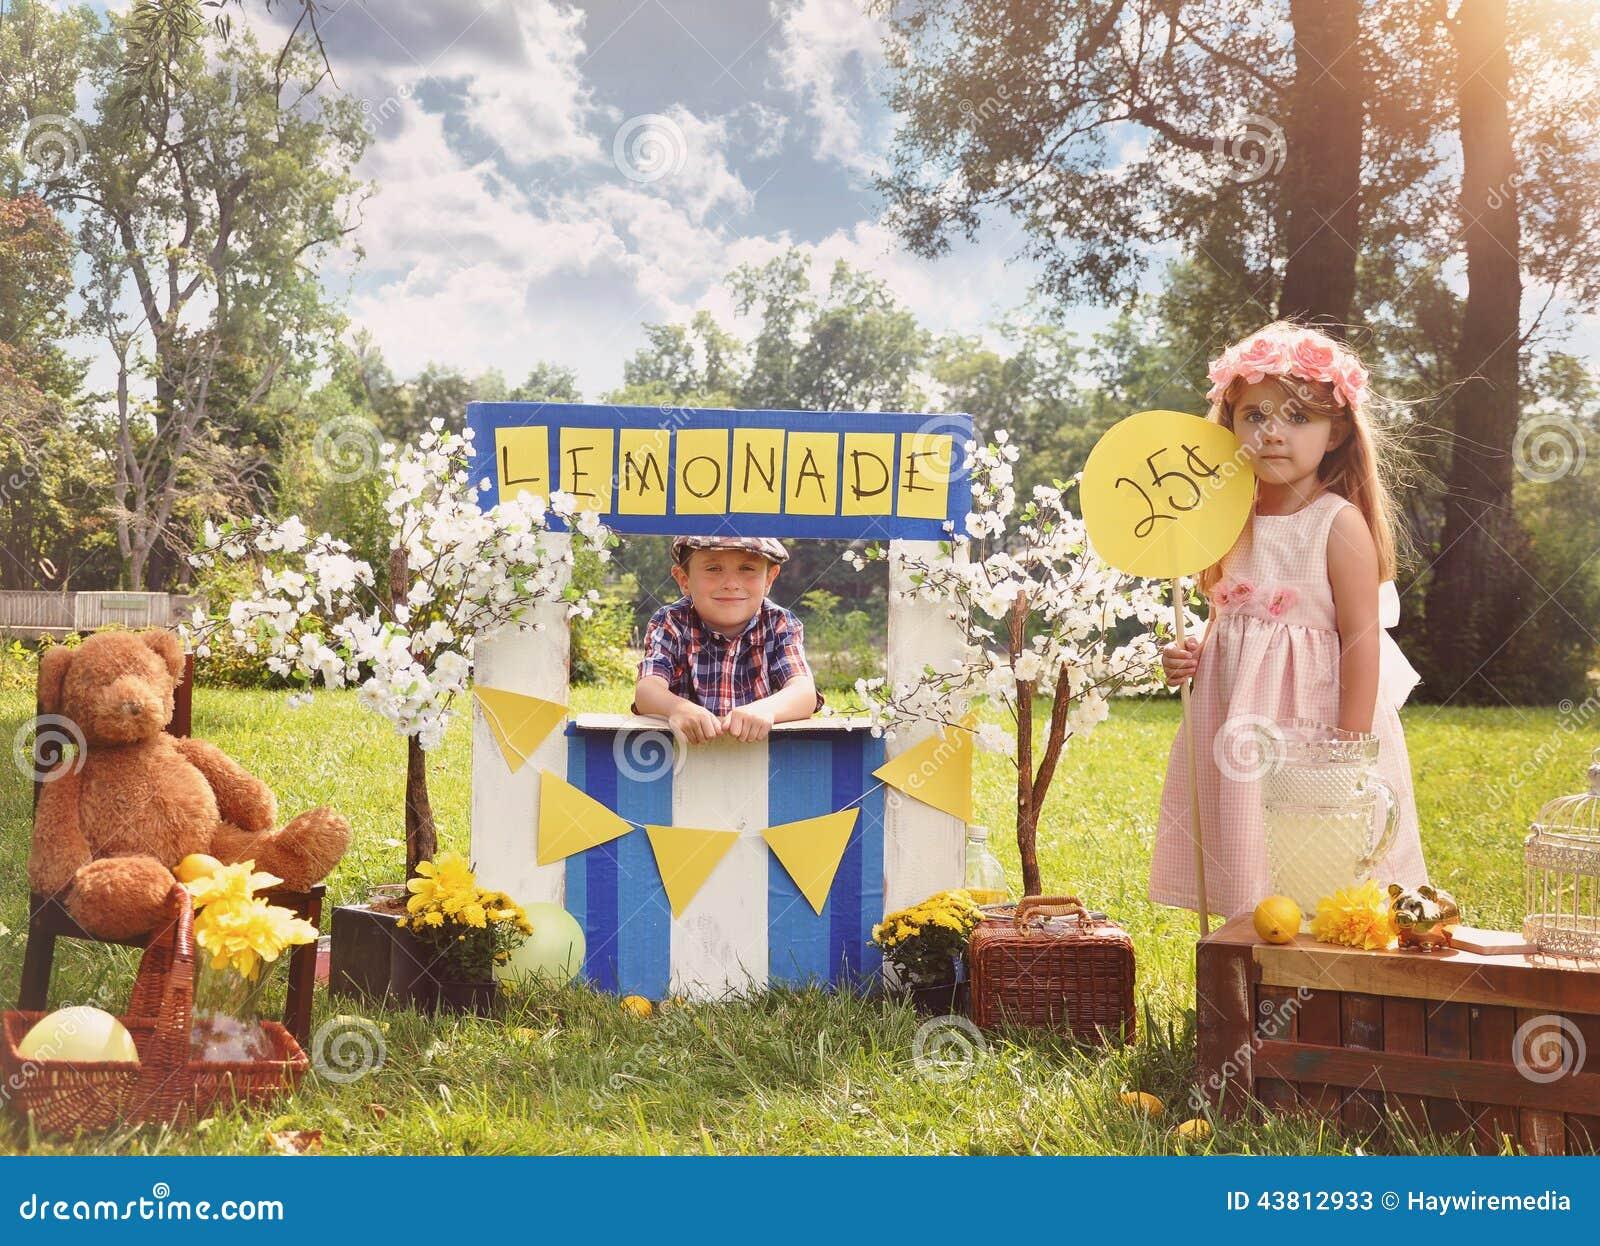 Entrepreneur Kids Selling Drinks at Lemonade Stand